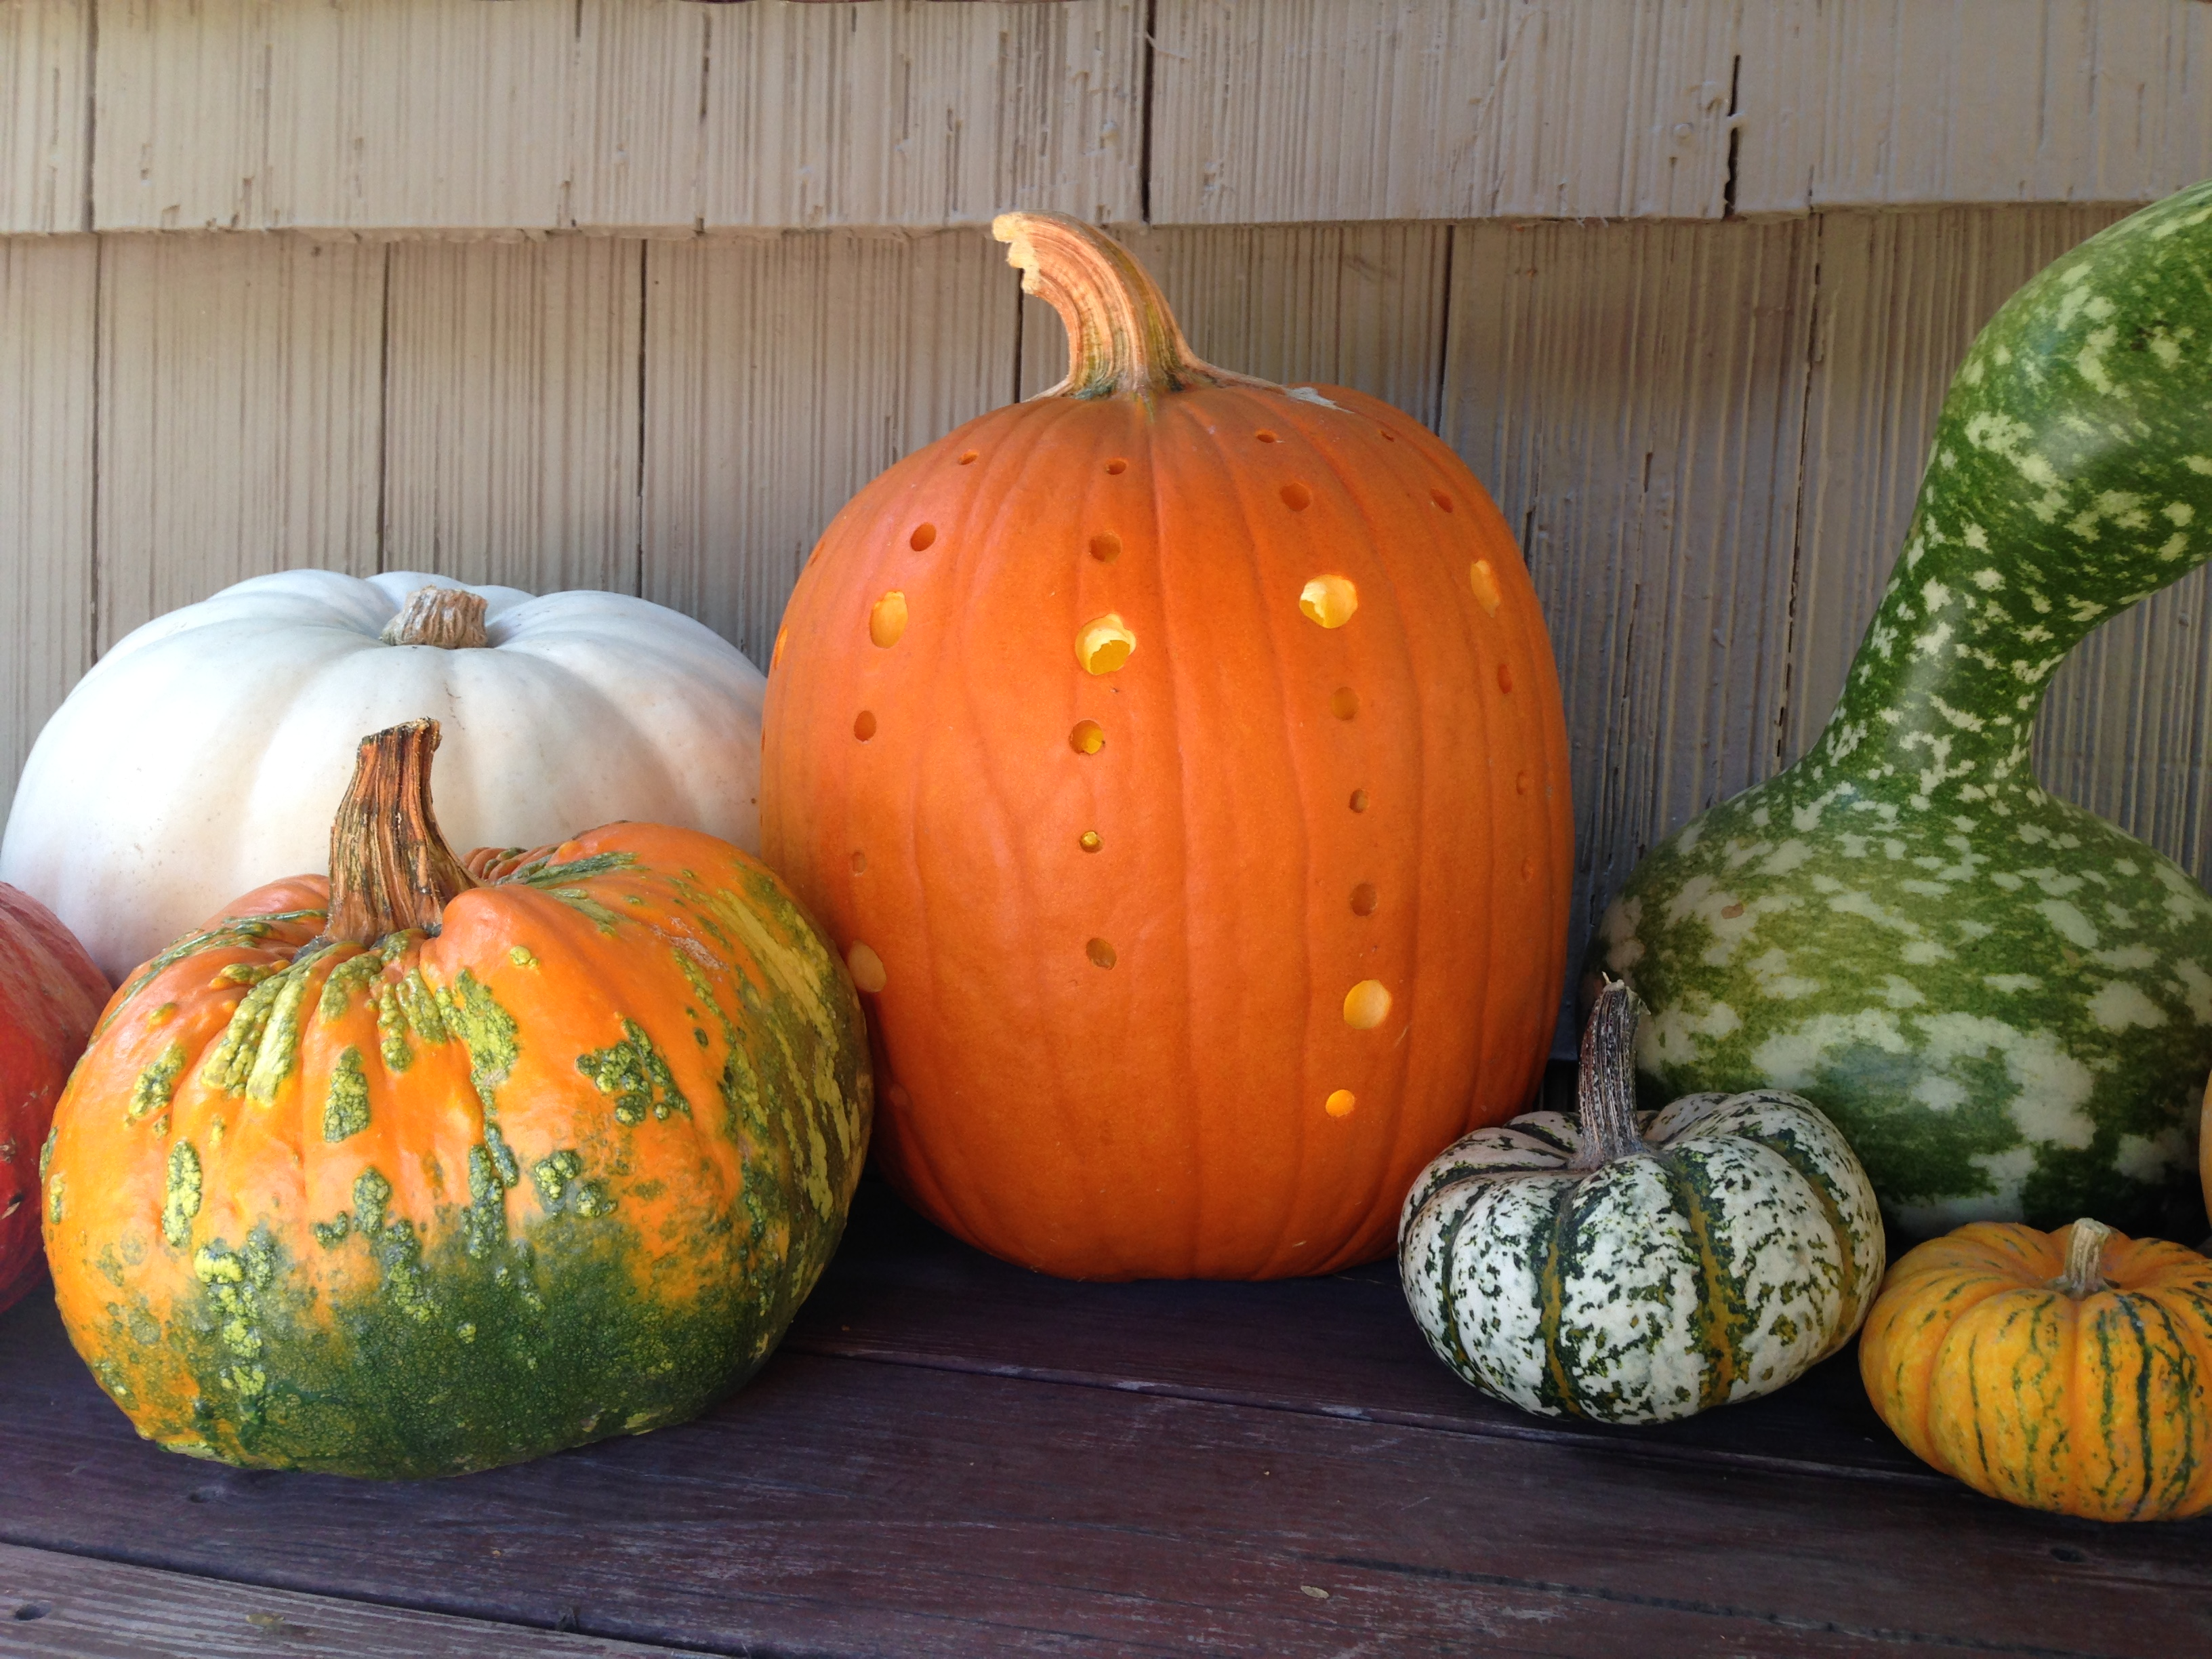 pumpkins & power drills: 10 creative jack-o'-lantern ideas